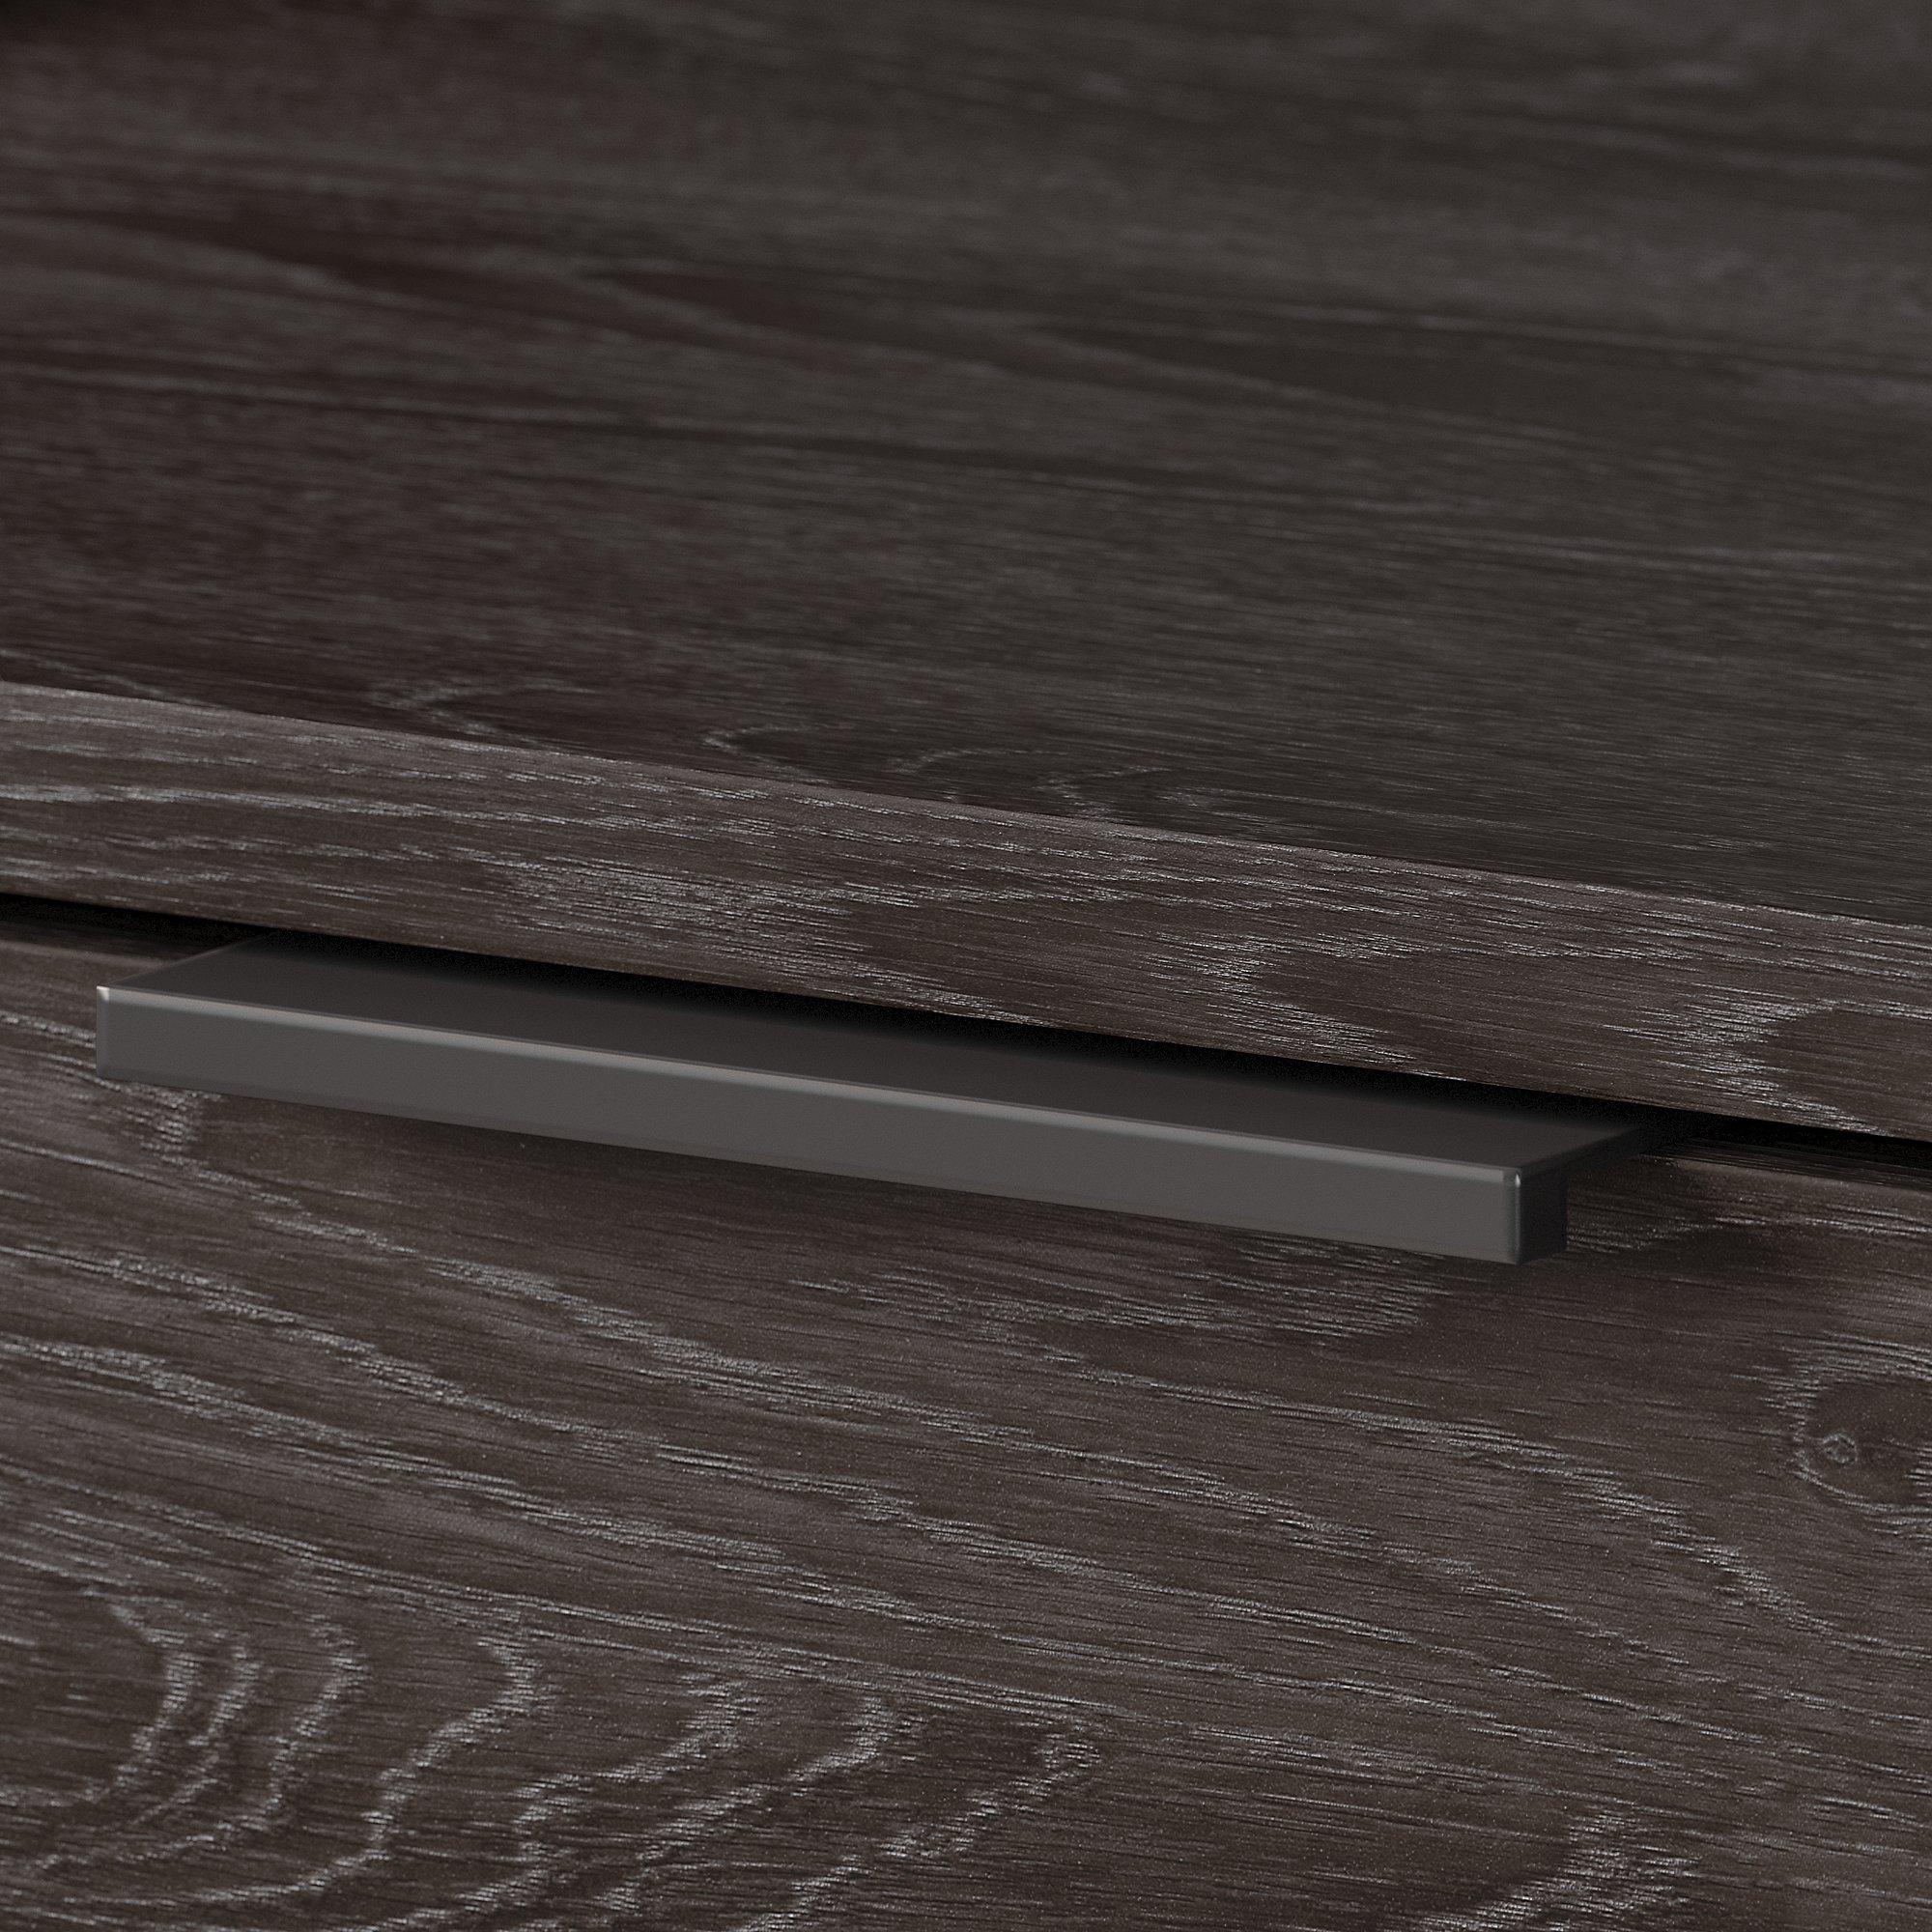 kathy ireland drawer pull